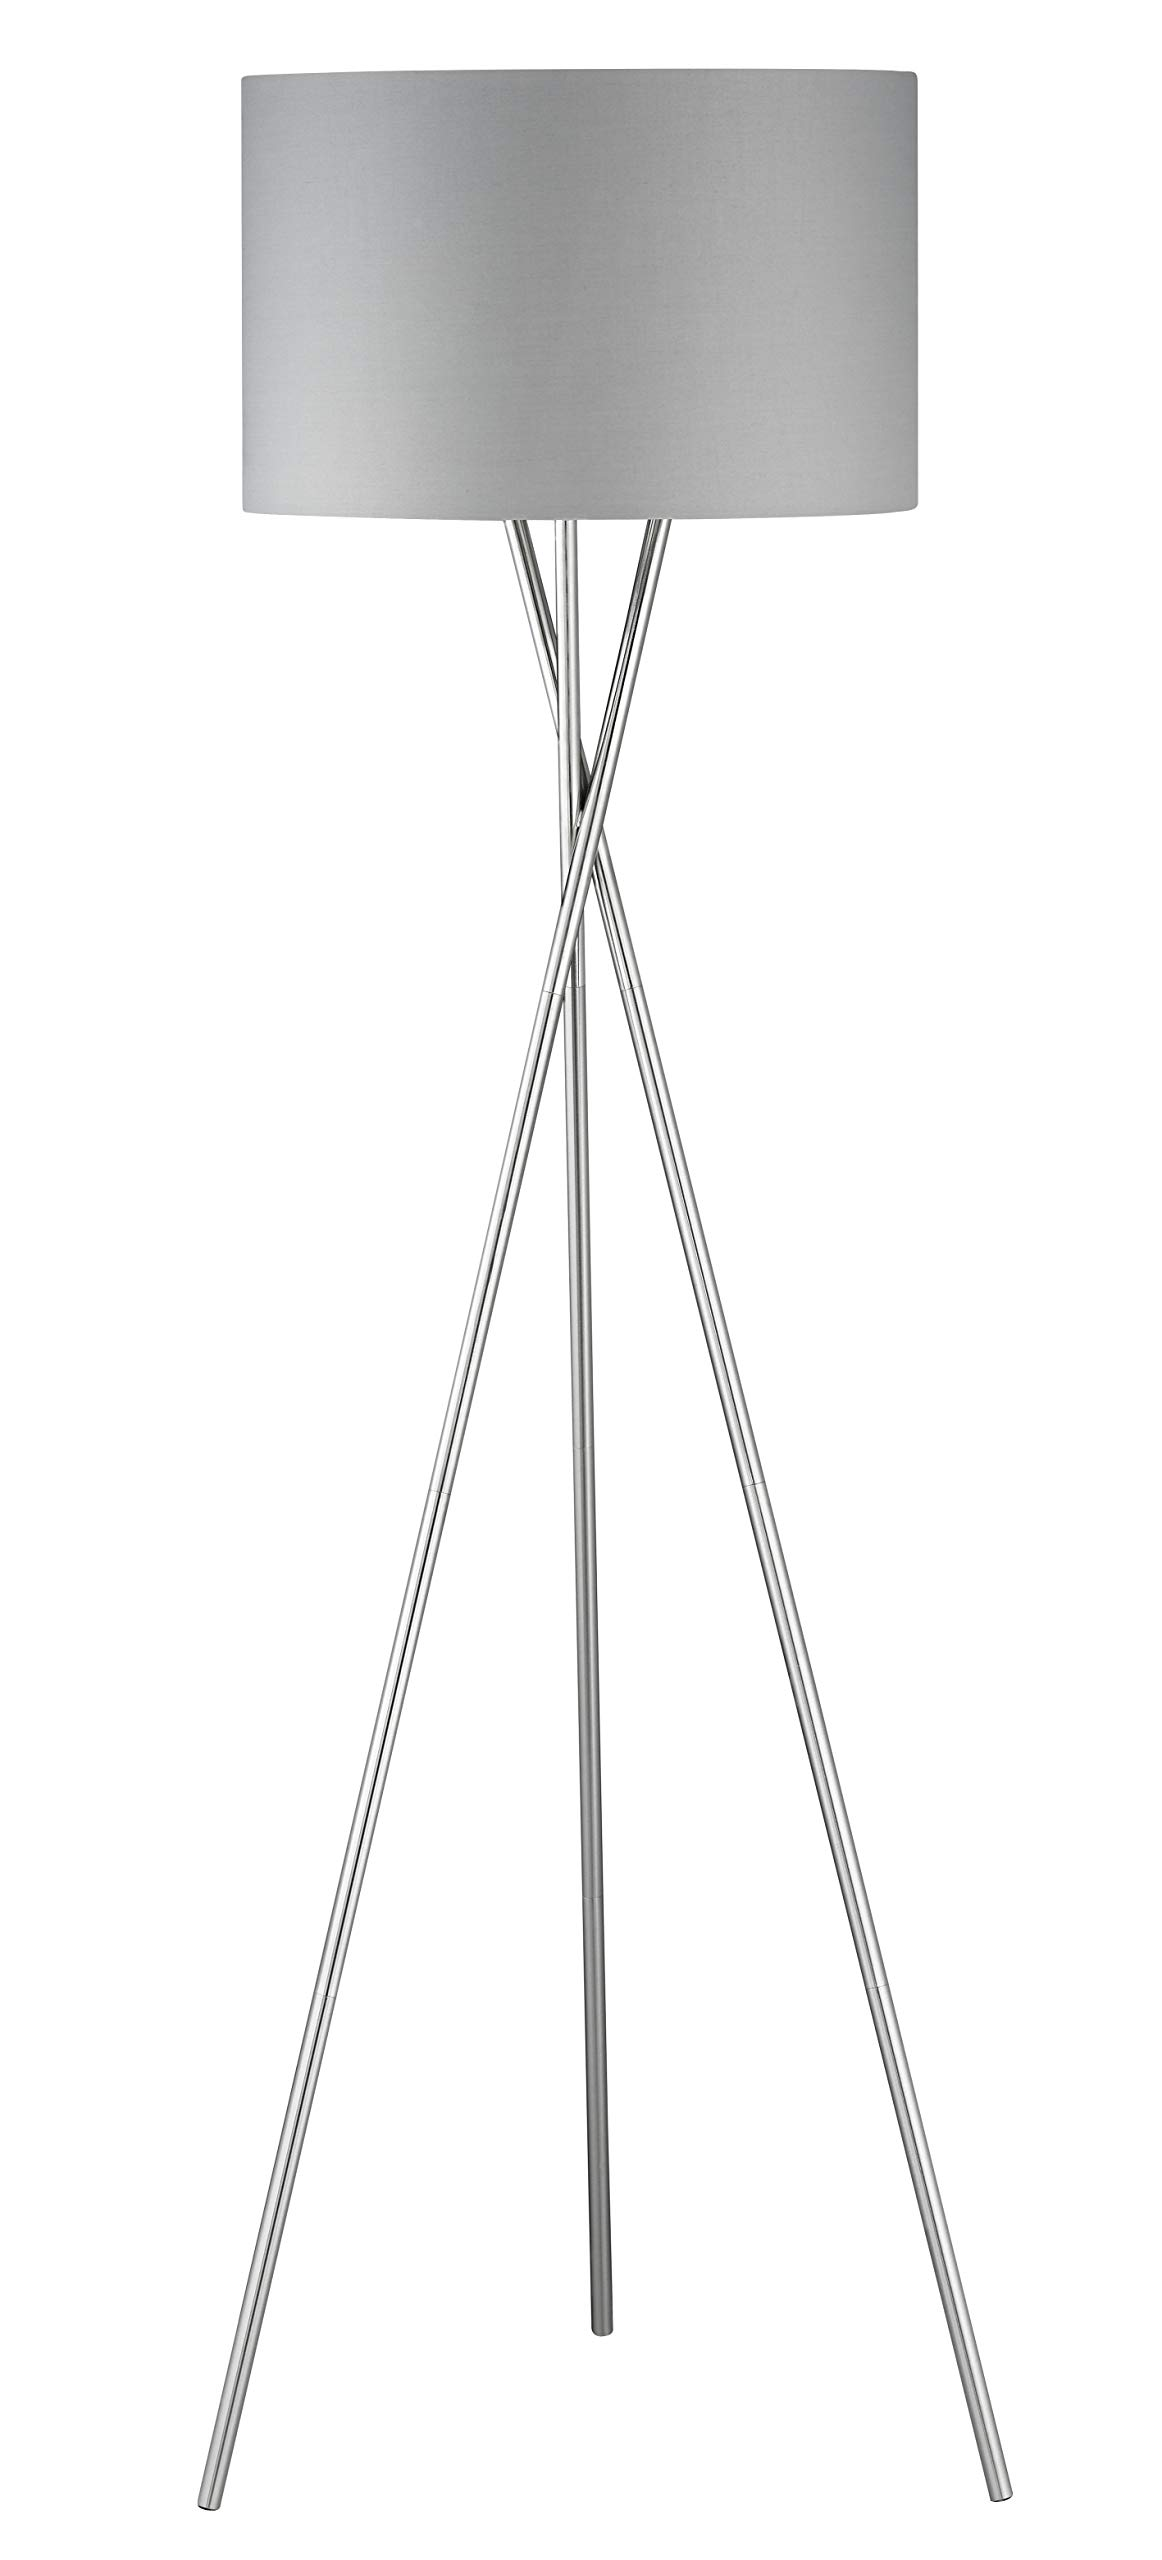 Fischer&Honsel WOTAN 落地灯,金属,60瓦,镍色